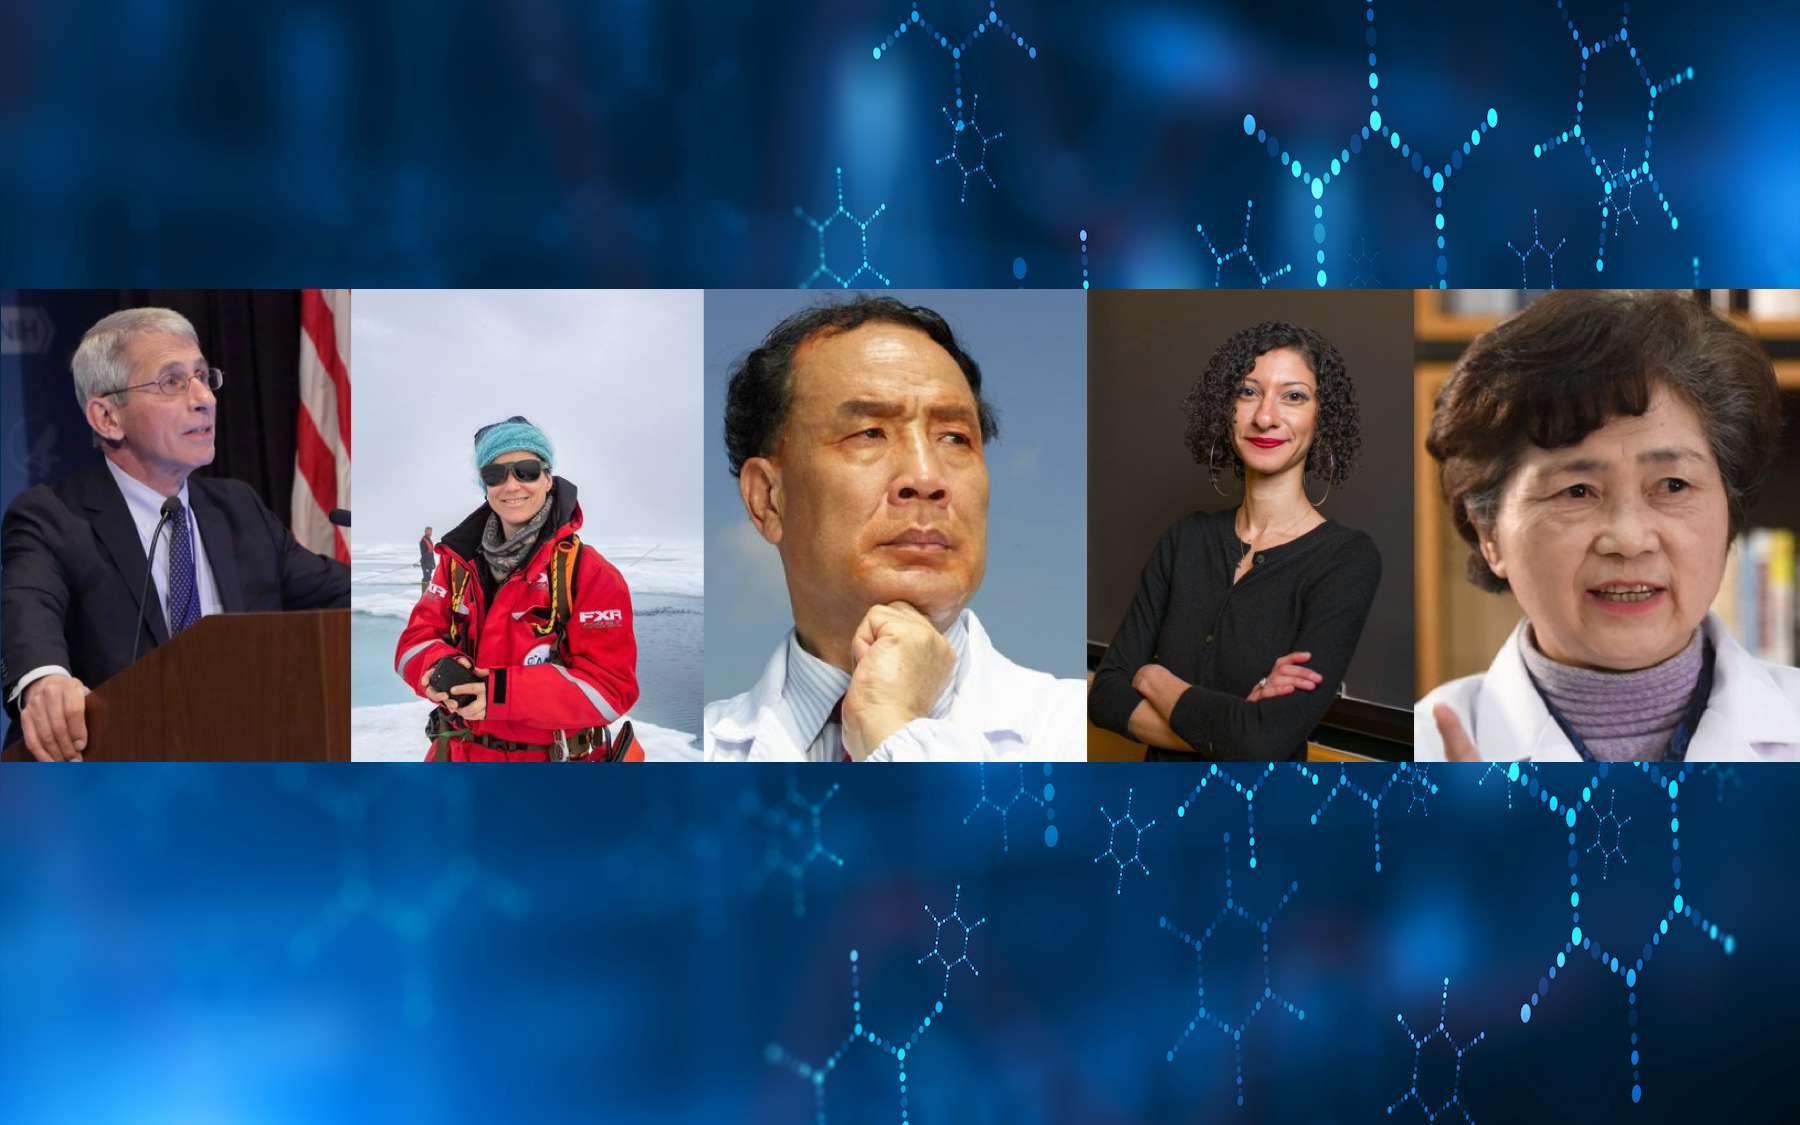 Les 10 personnalités qui ont marqué la science en 2020. © foxaon, Adobe Stock ; NIAID ; Jeremy Gasowski ; Twitter